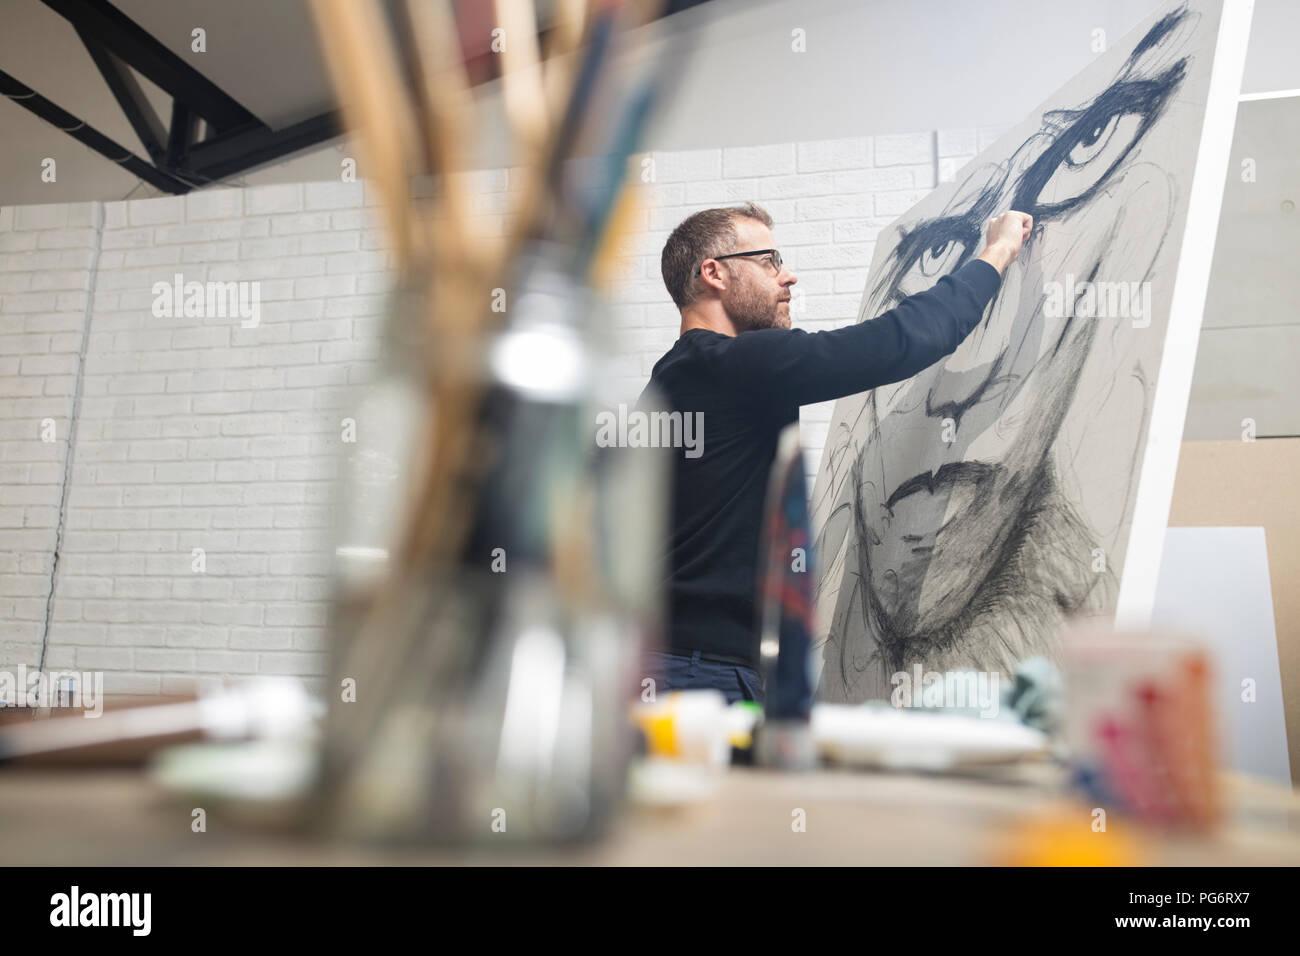 Man checking drawing in studio - Stock Image